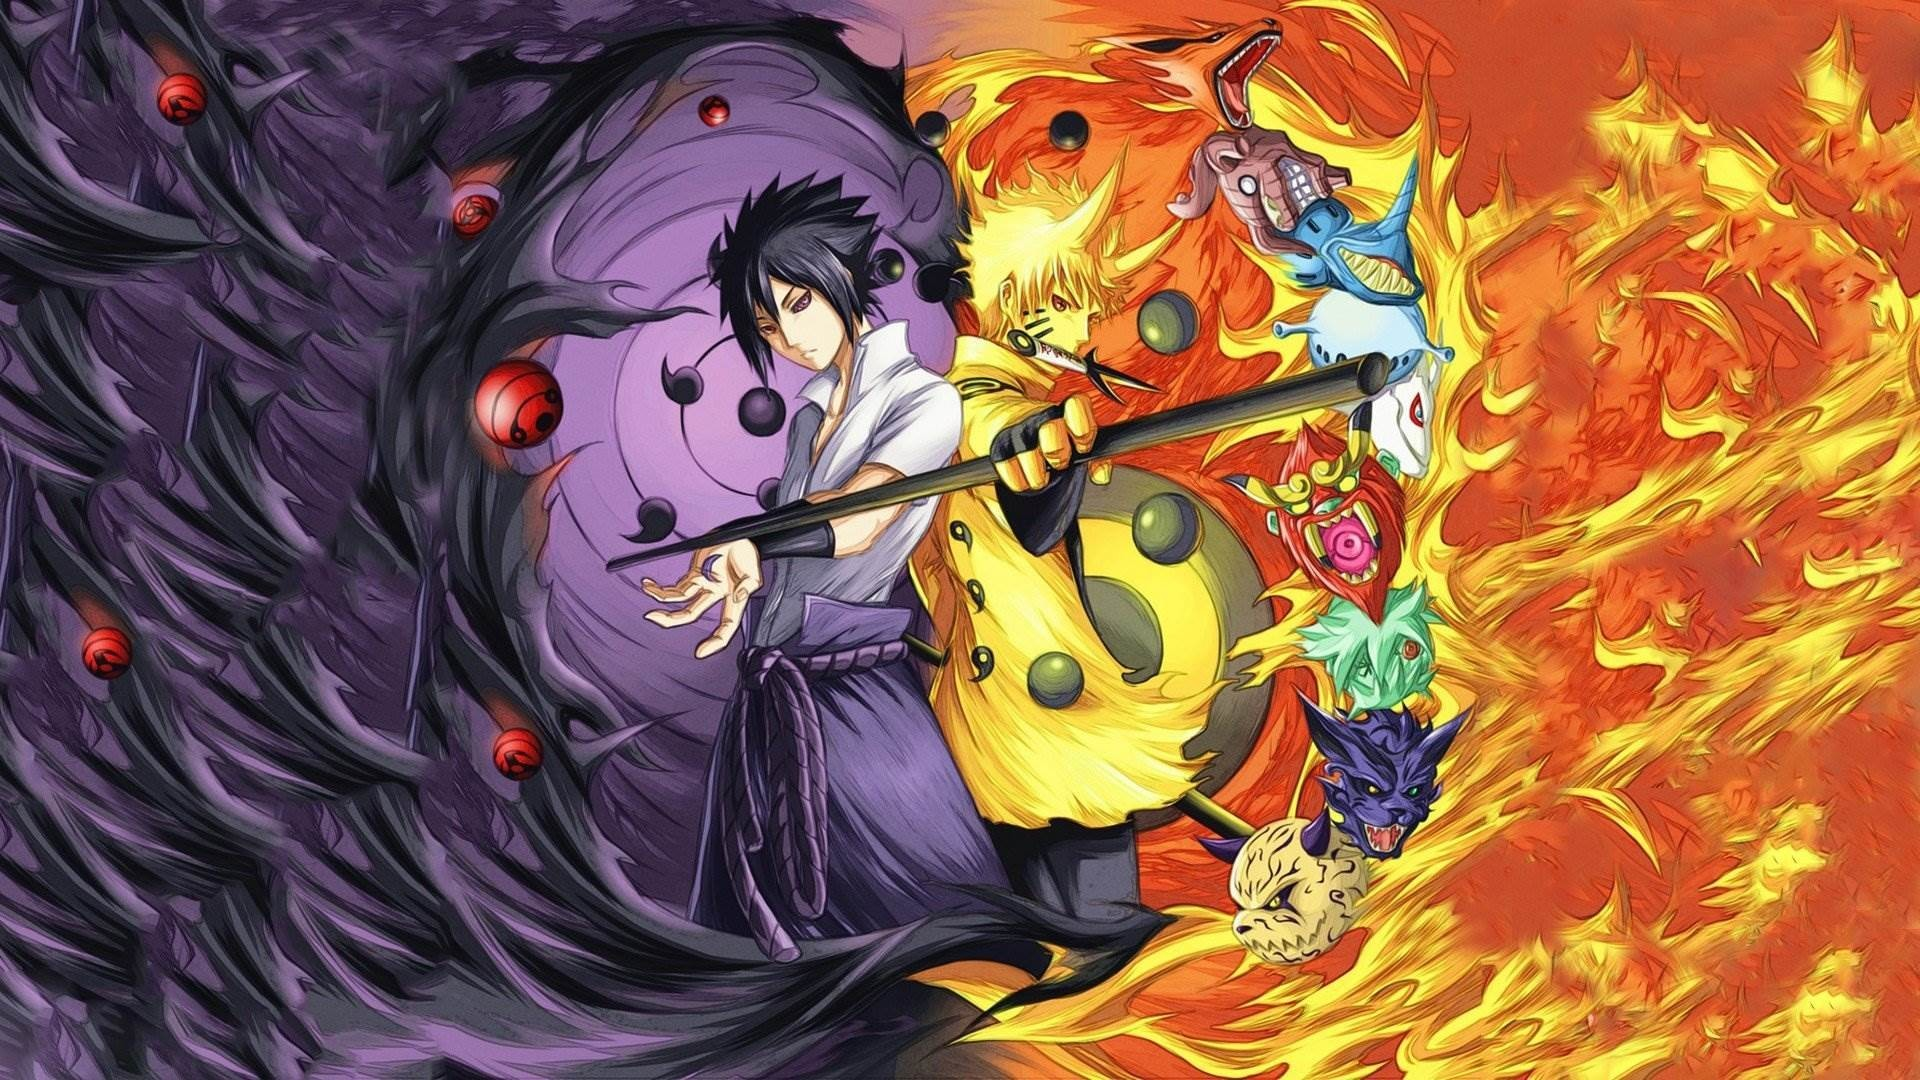 1080p High Resolution Naruto Wallpaper Anime Wallpaper Hd